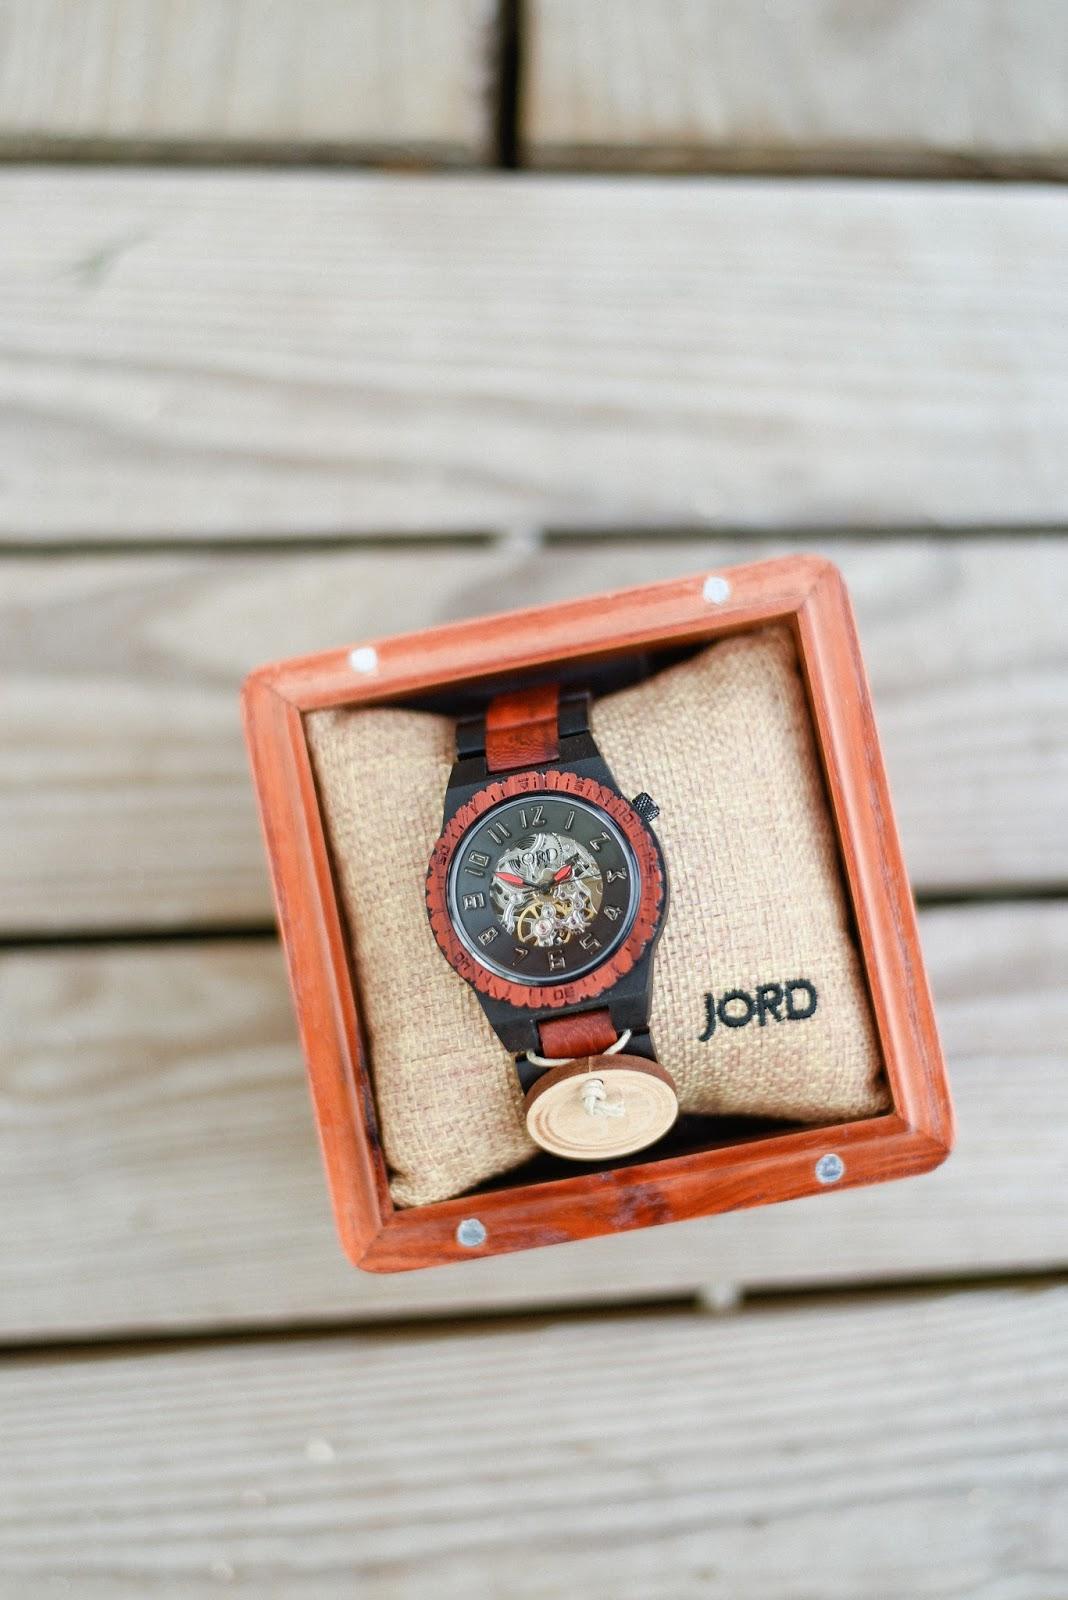 JORD (Dover Series) Watch